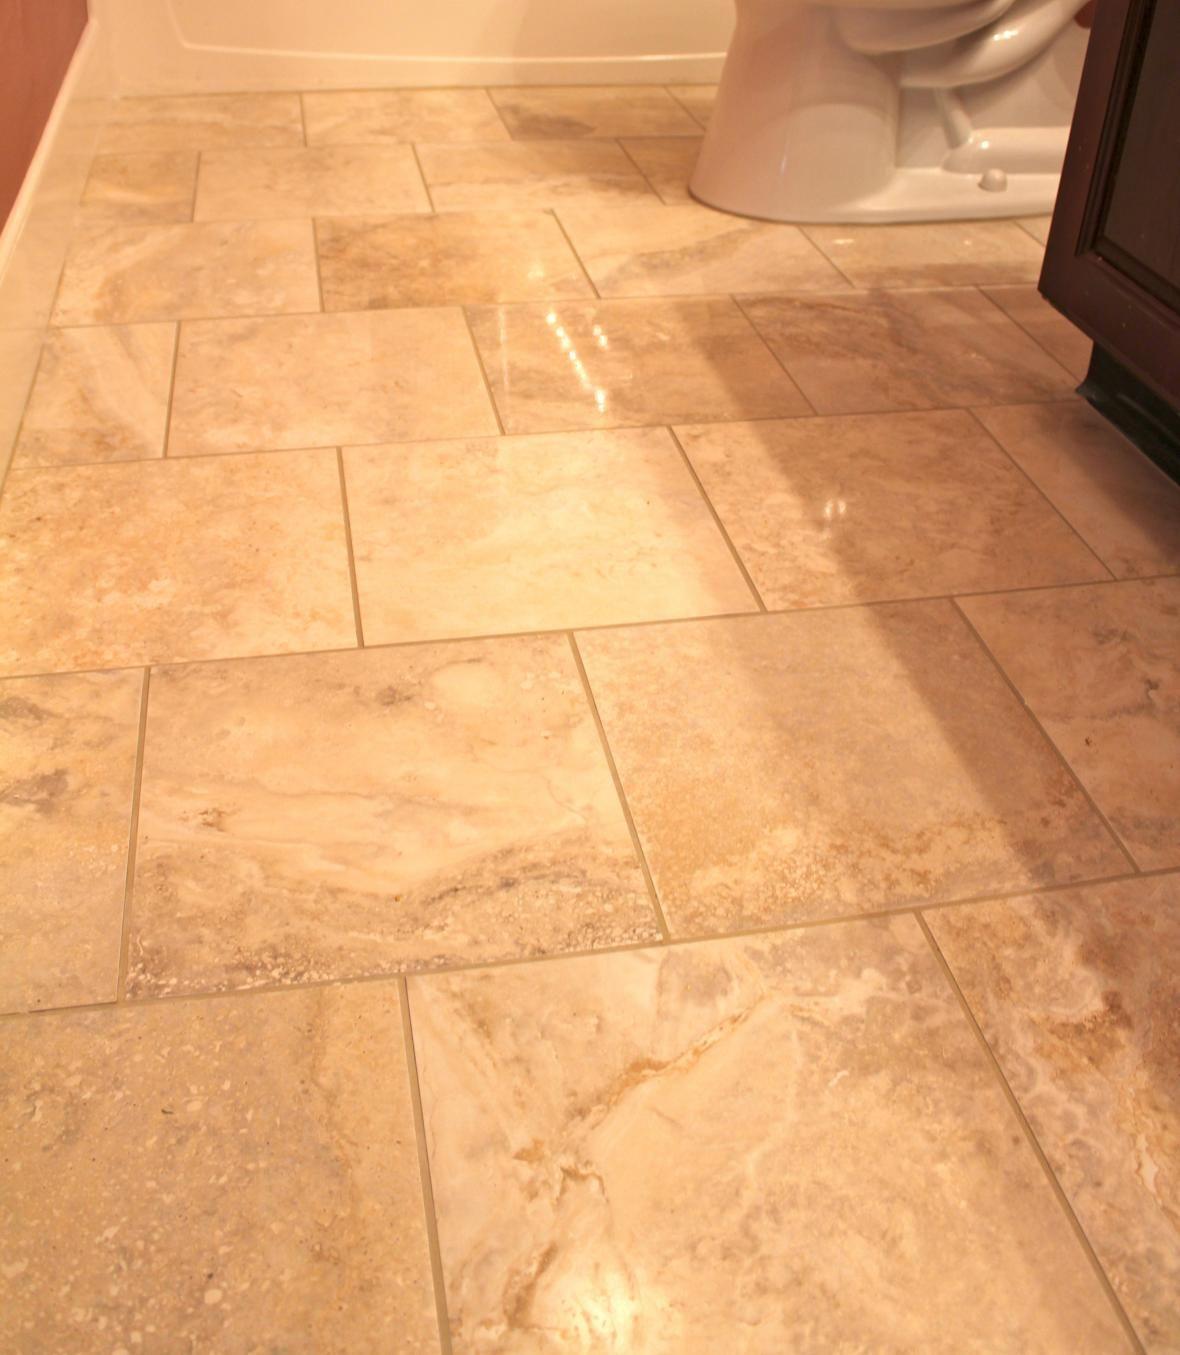 1 mln bathroom tile ideas pinteres 2017 bathroom tiles floor on about porcelain tile bathroom floor tile bathroom with glass border bathroom tiles floor dailygadgetfo Images